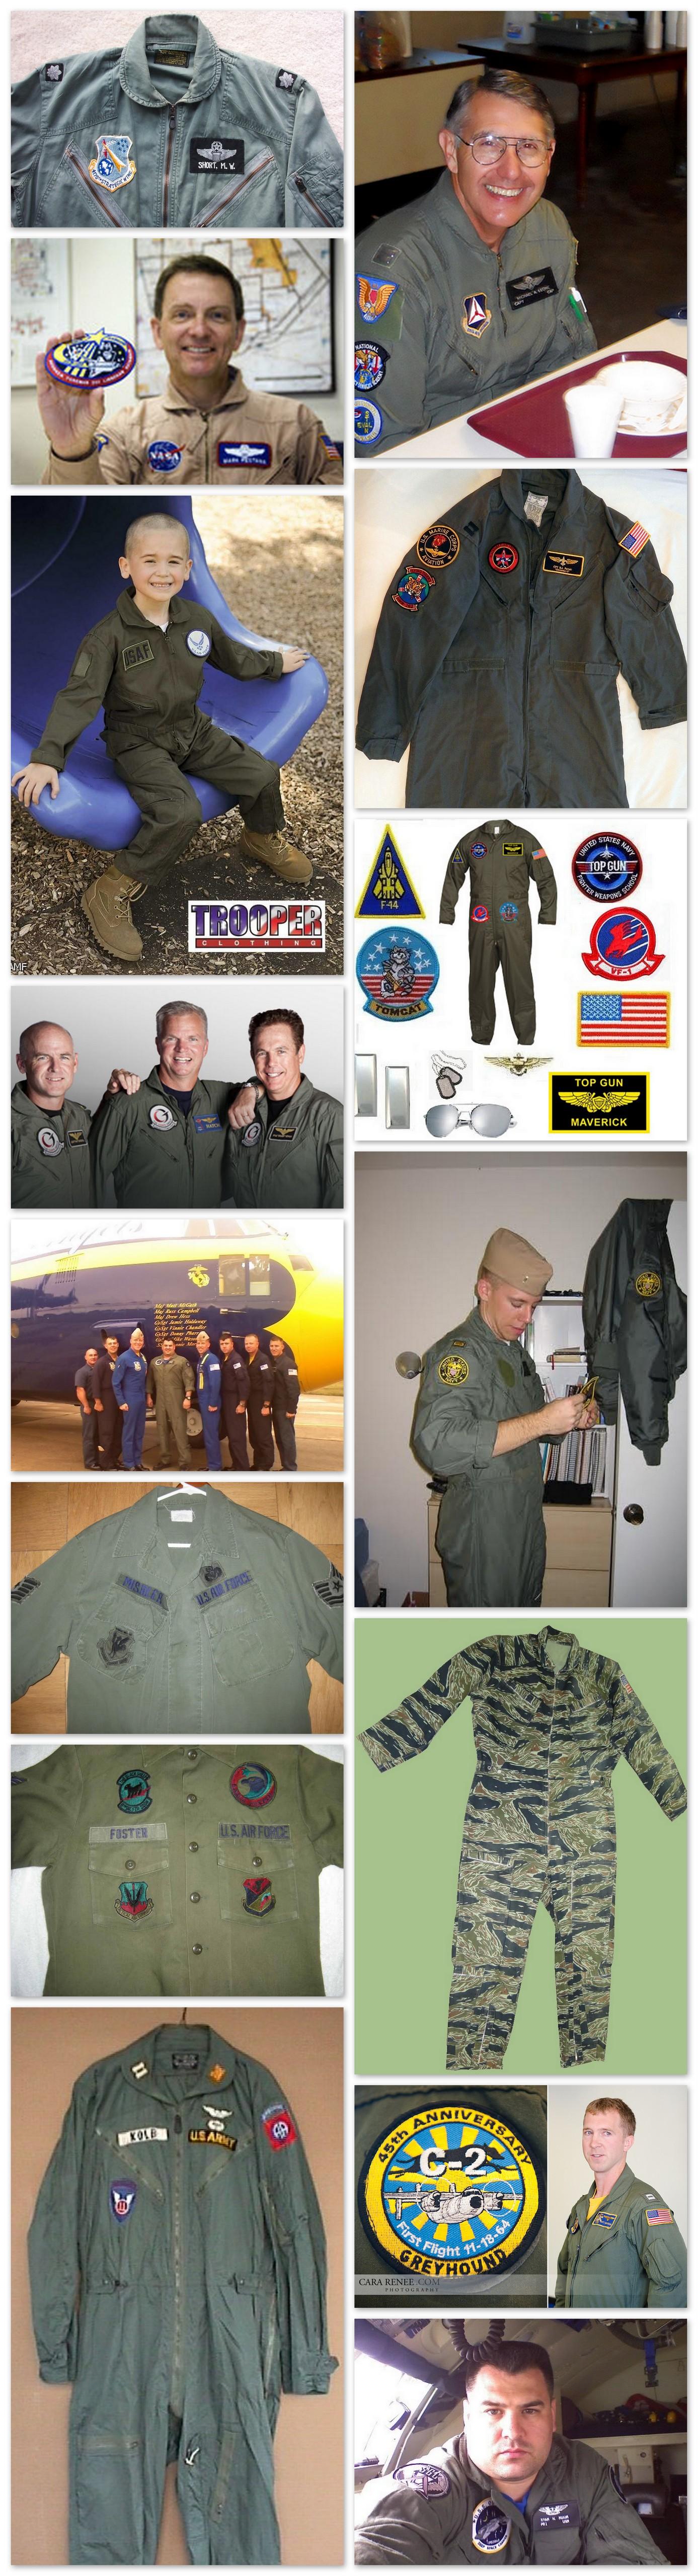 Buy Air flight force suit patch placement picture trends